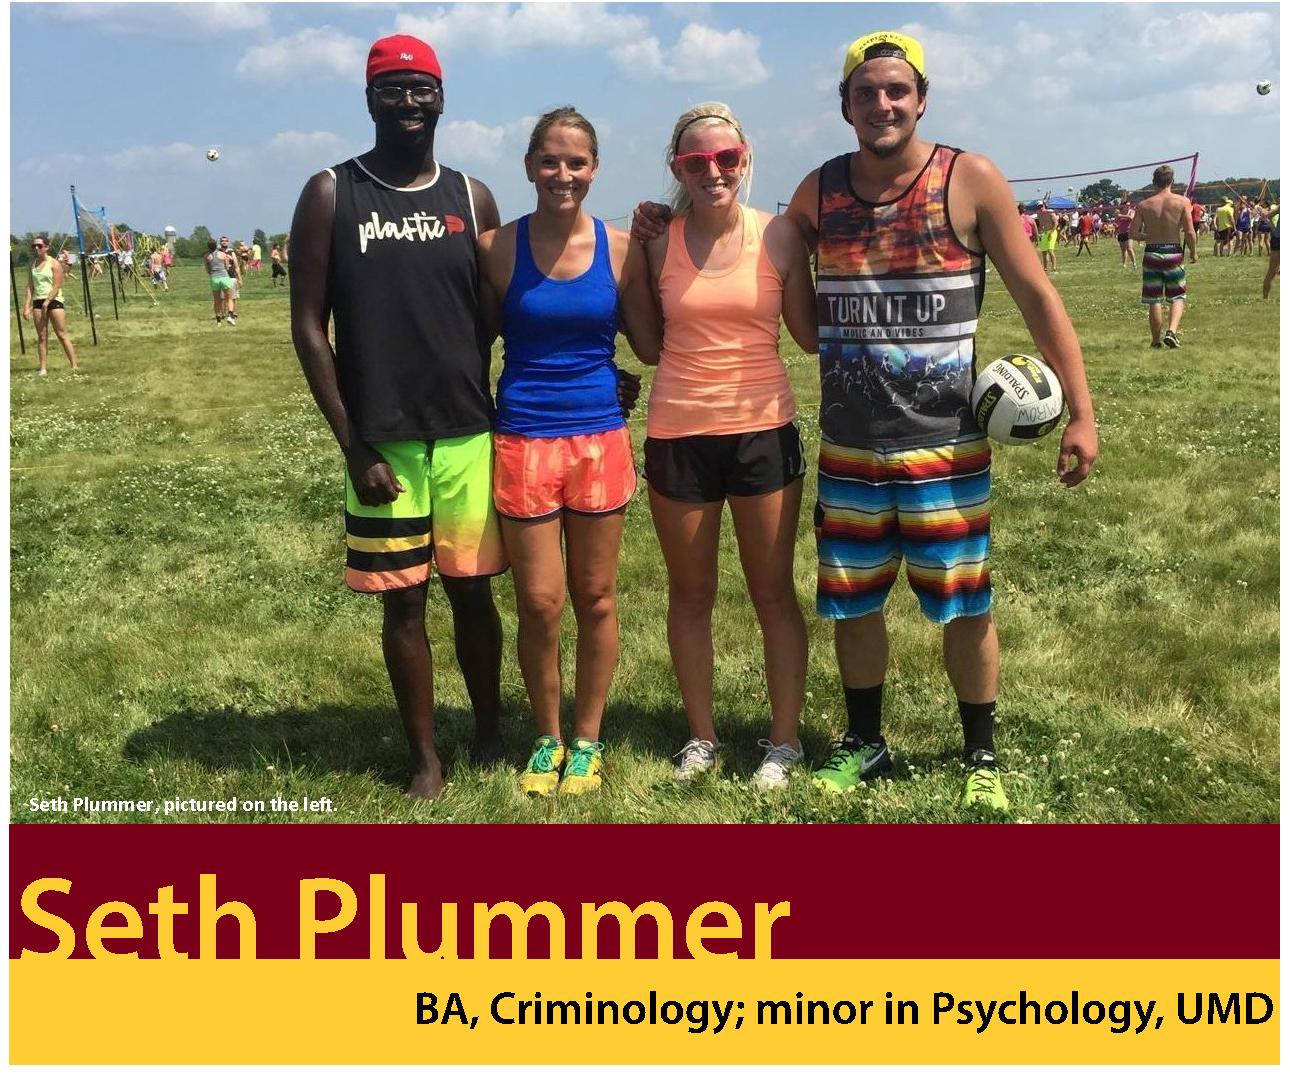 Alumni Photo: Seth Plummer